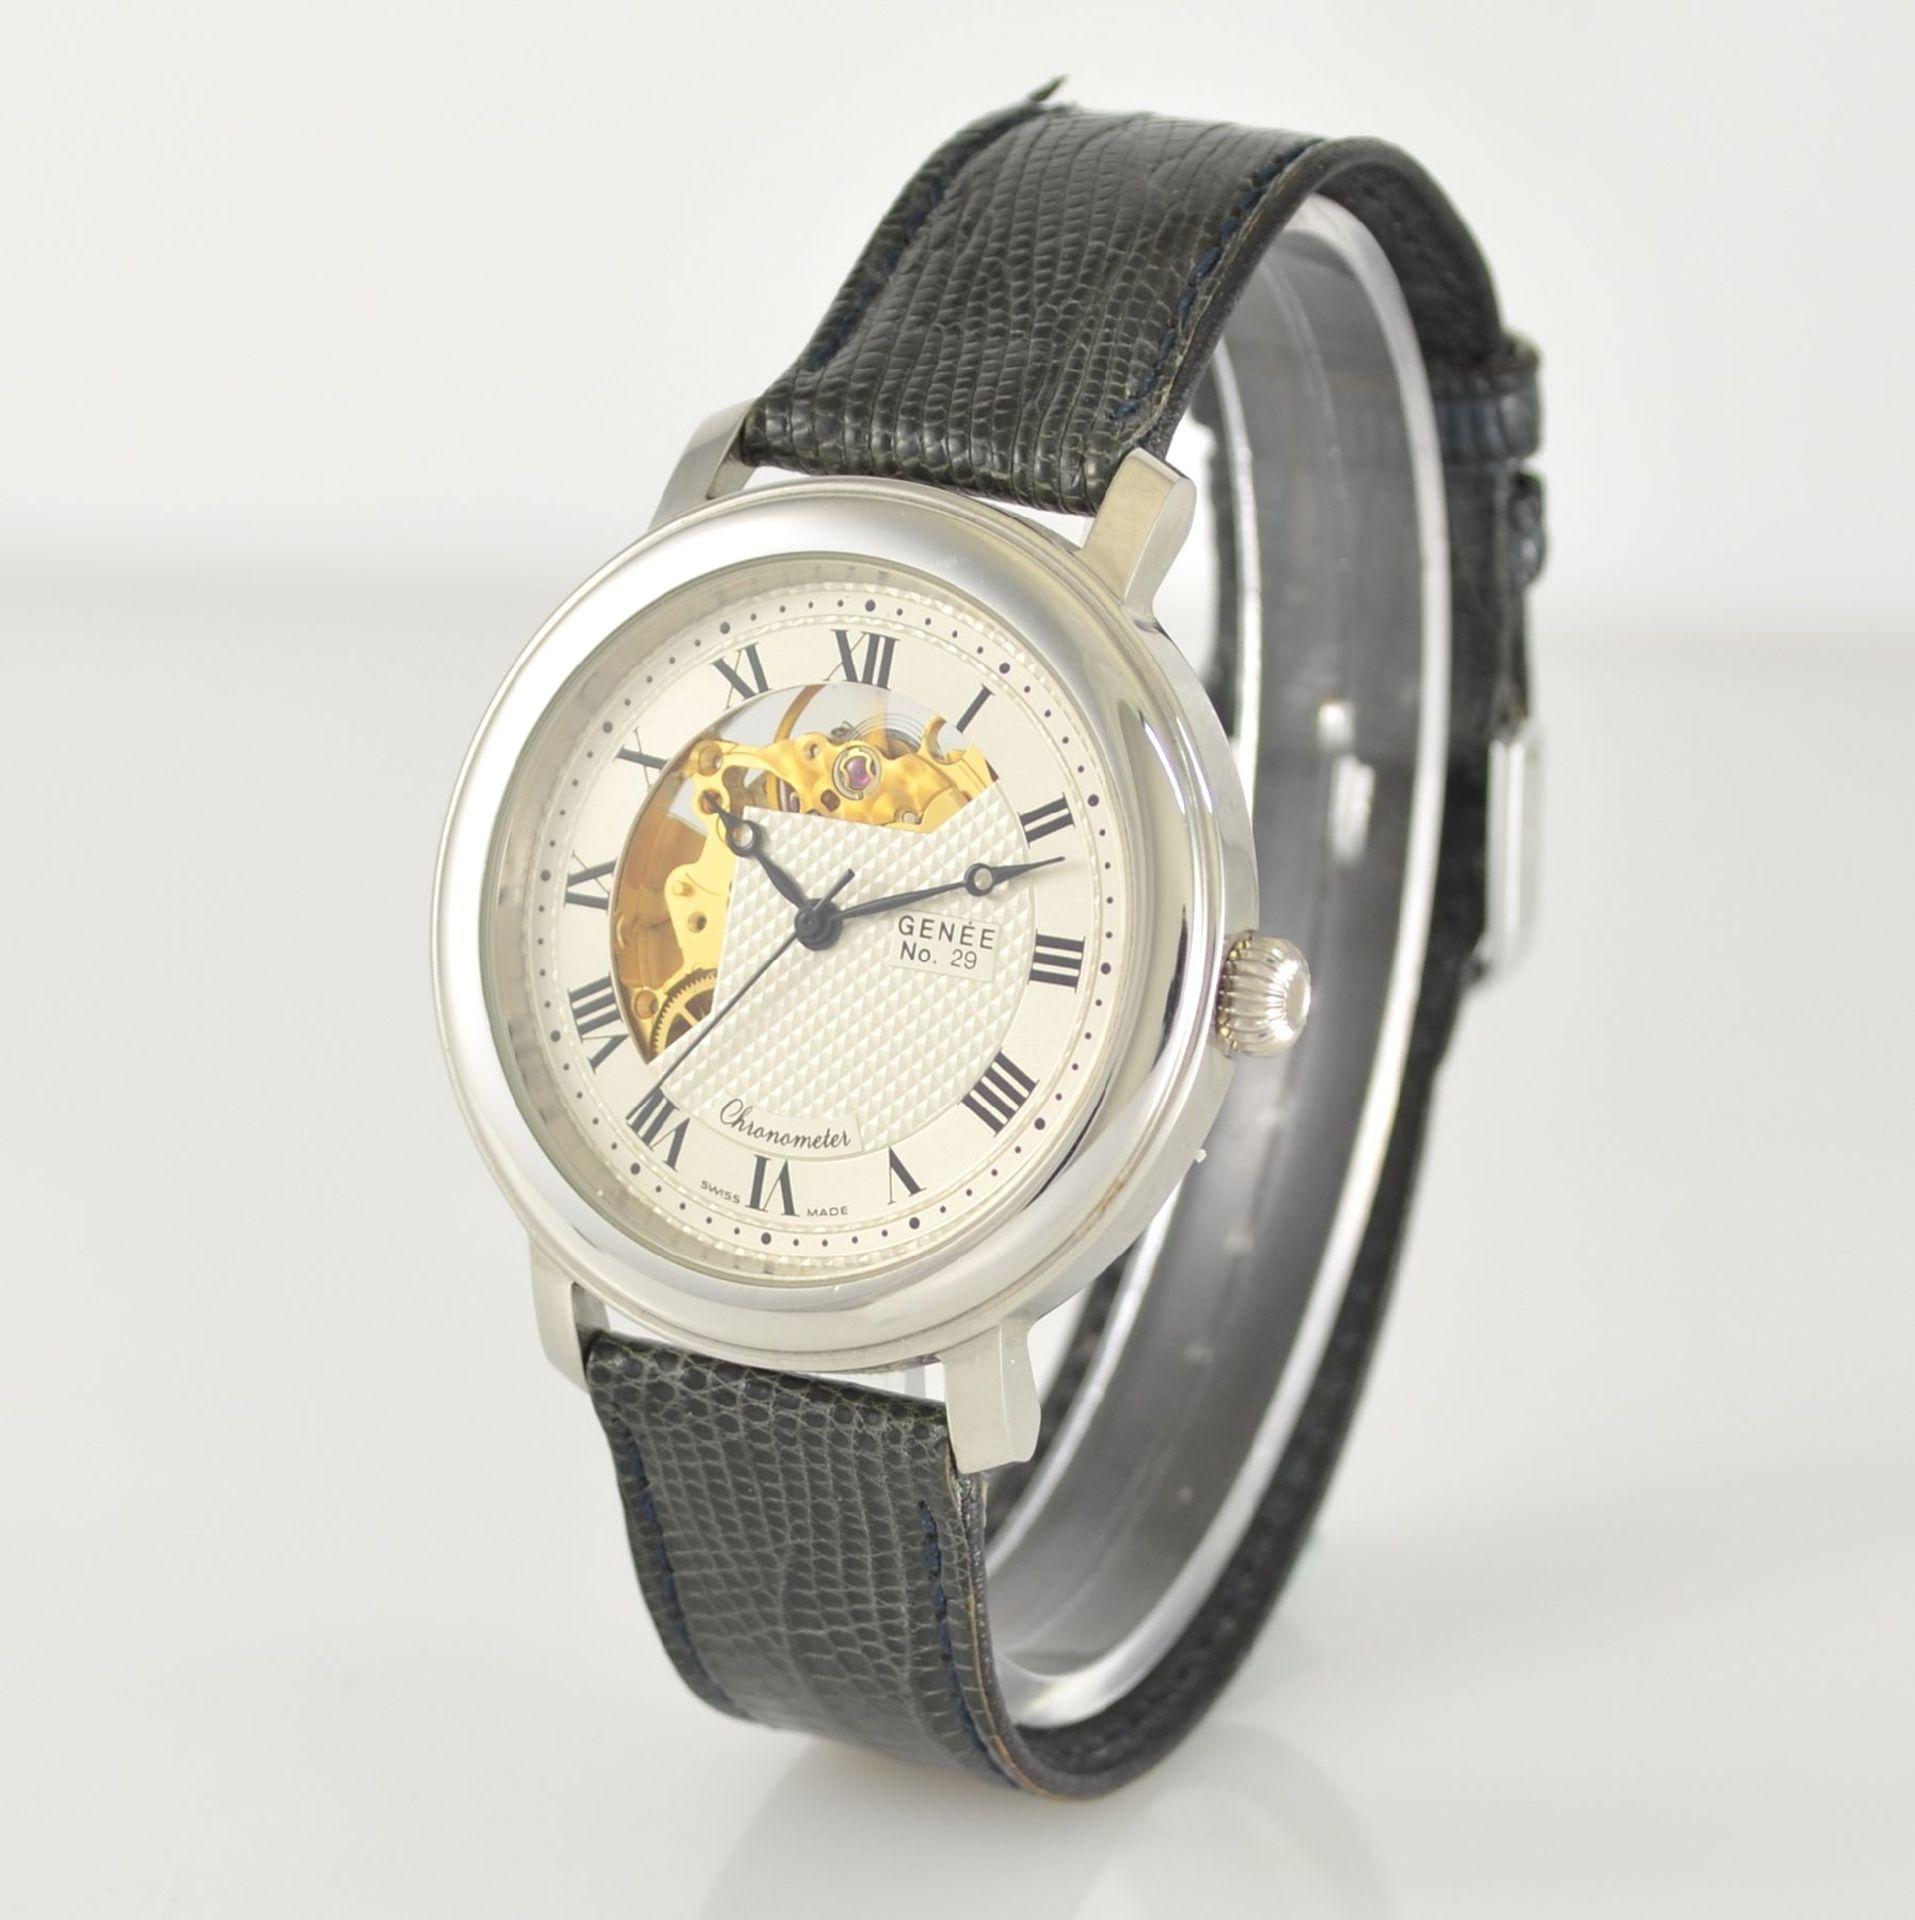 GENÉE No. 29 Chronometer-Herrenarmbanduhr in Stahl, Schweiz lt. beiliegendem Chronometerzertifikat - Bild 3 aus 8